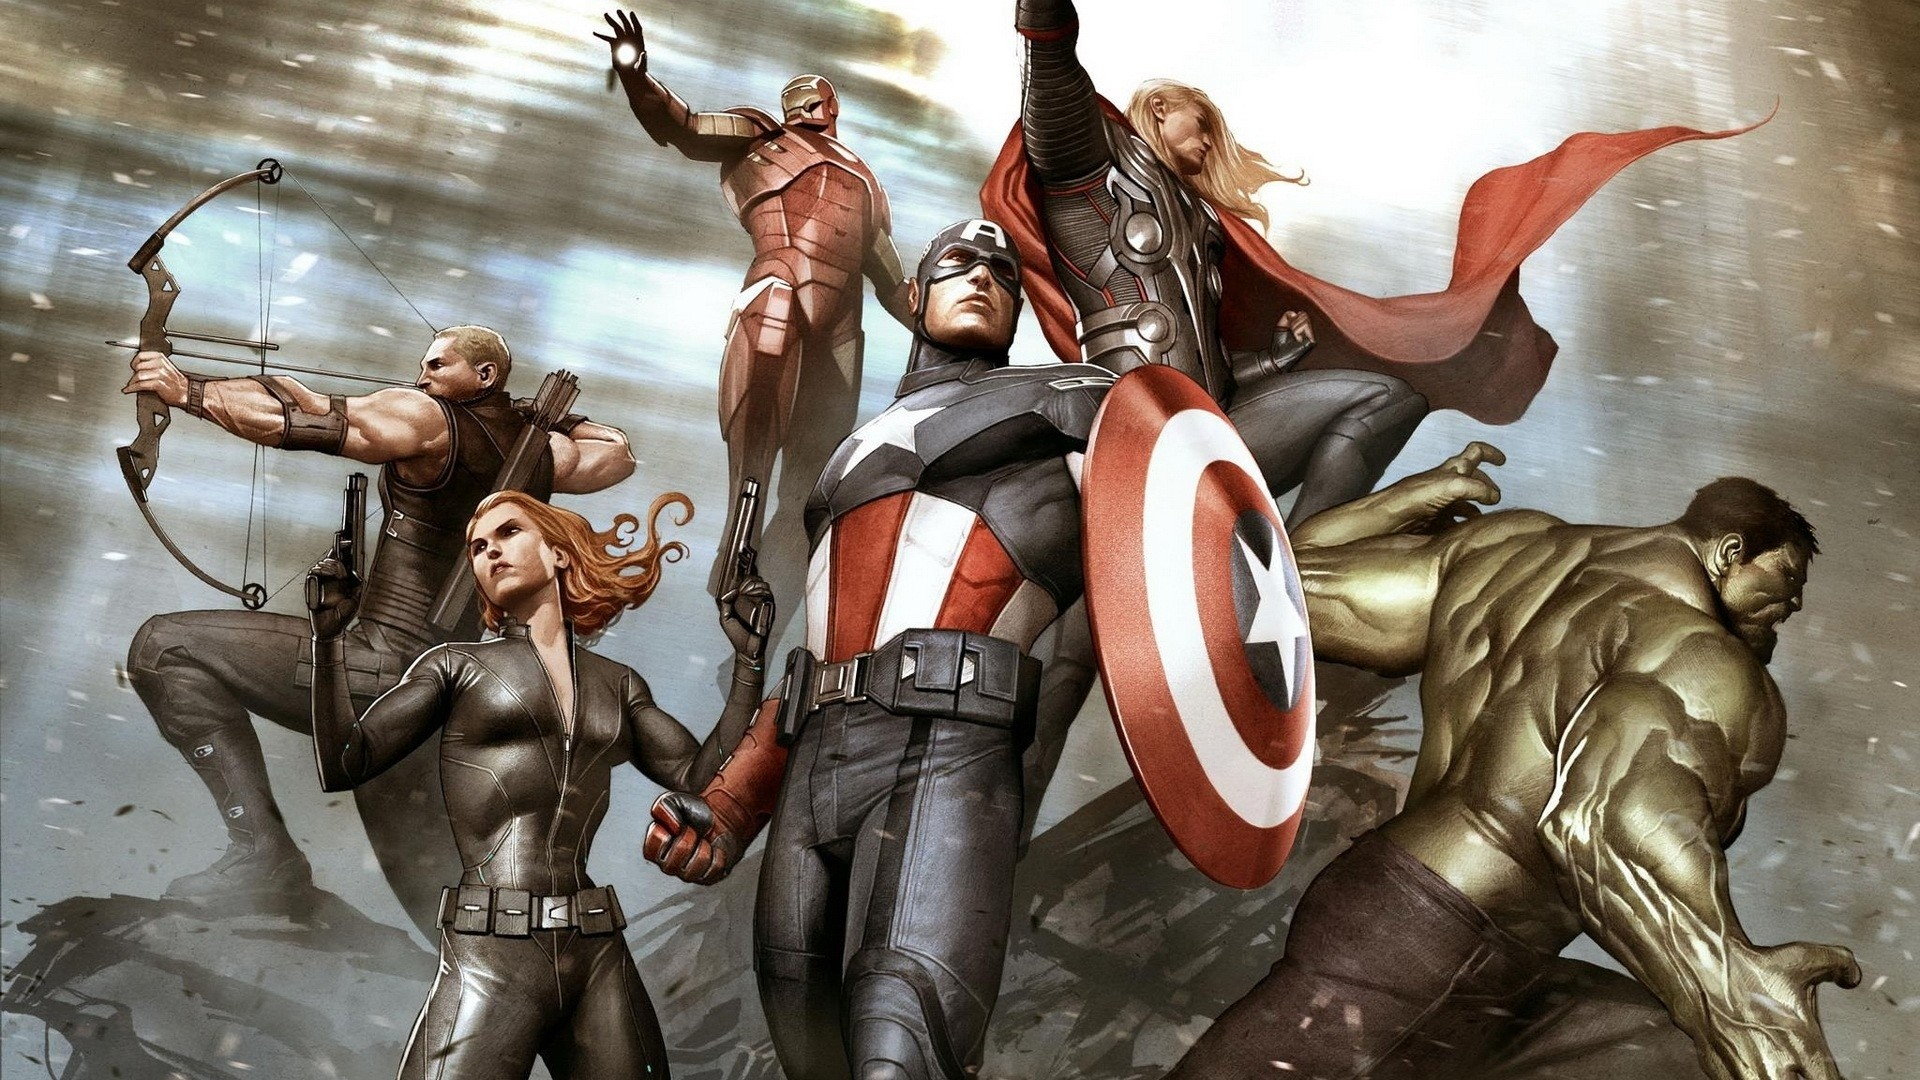 MARVELS THE AVENGERS superhero f wallpaper | | 102266 |  WallpaperUP